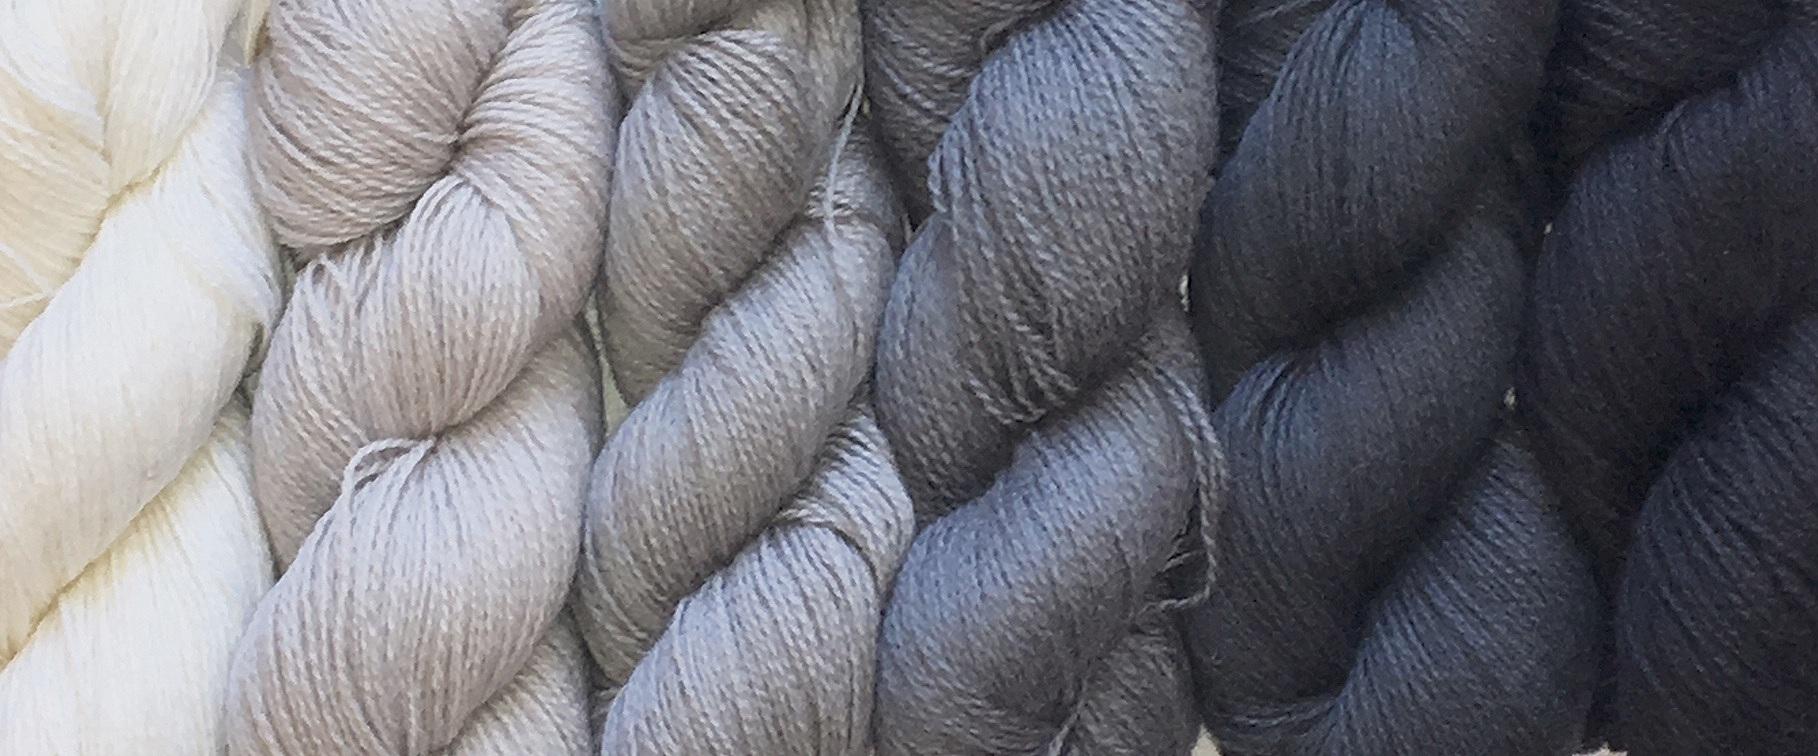 Gray Scale in  Anahera  yarn.  photo credit:  Elizabeth J. Buckley